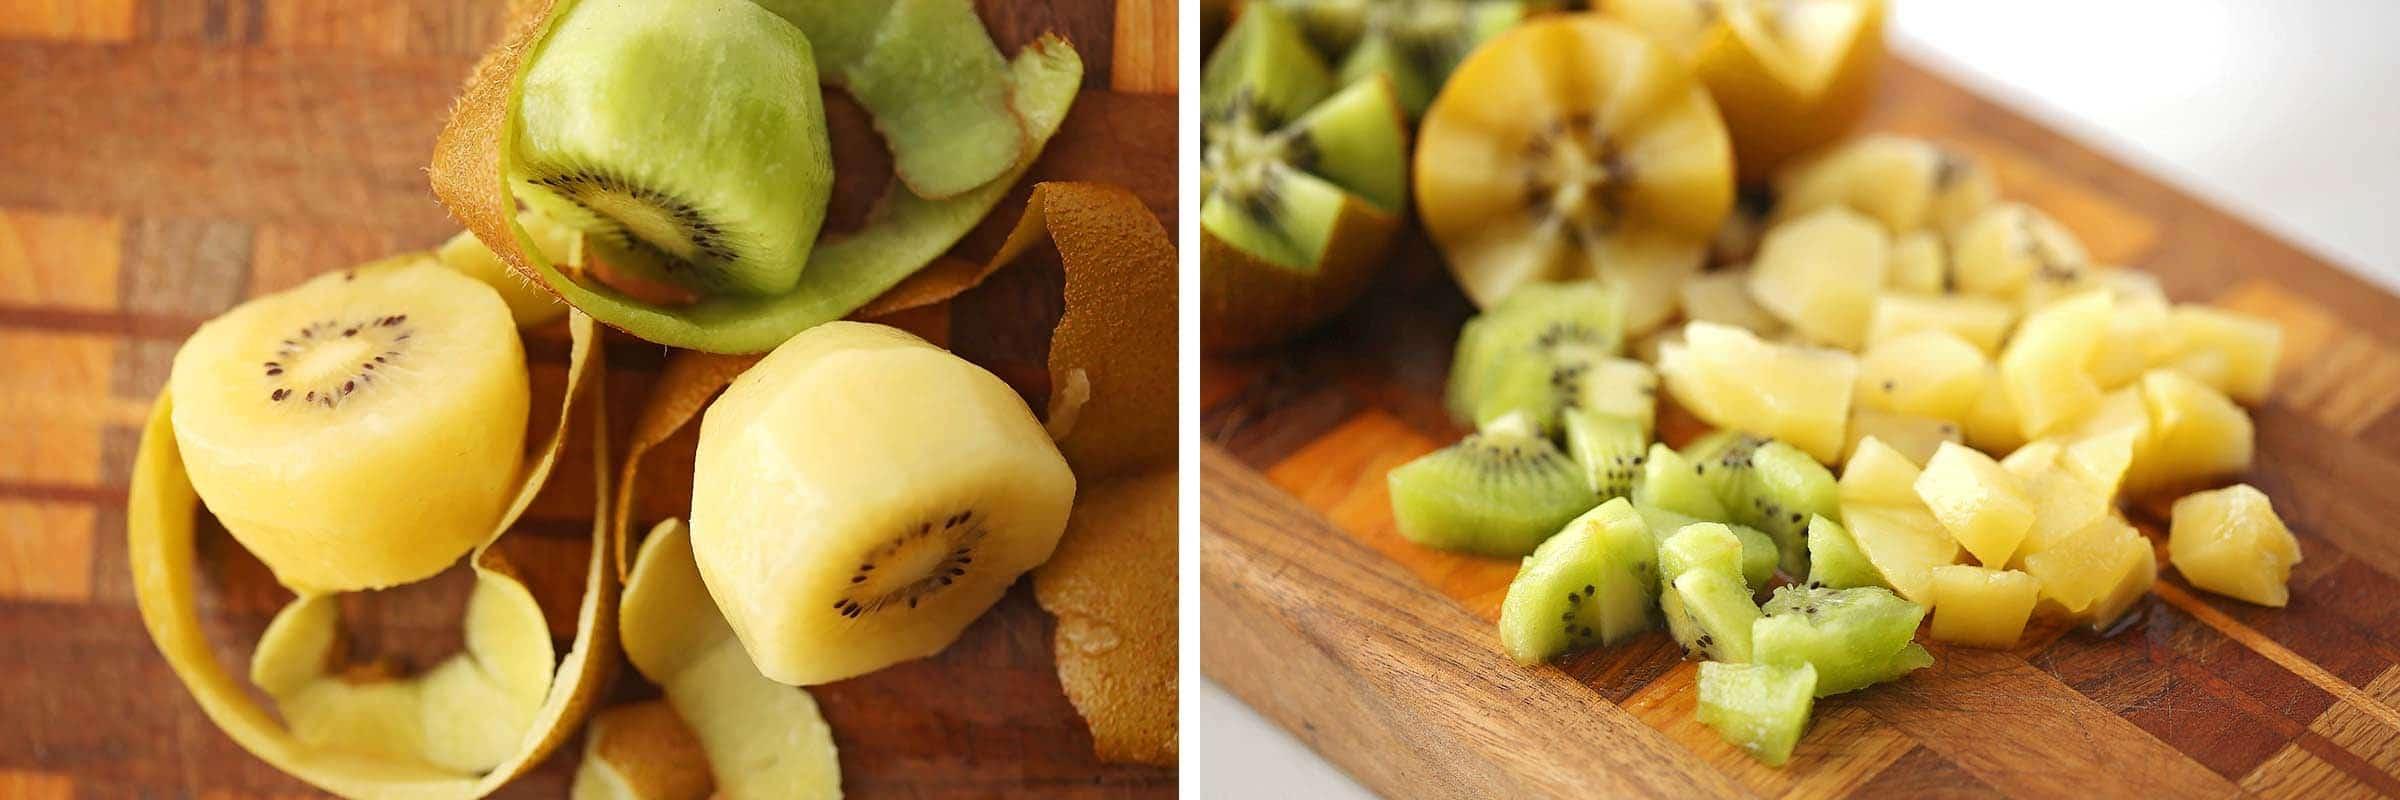 images of kiwi fruit peeled and diced